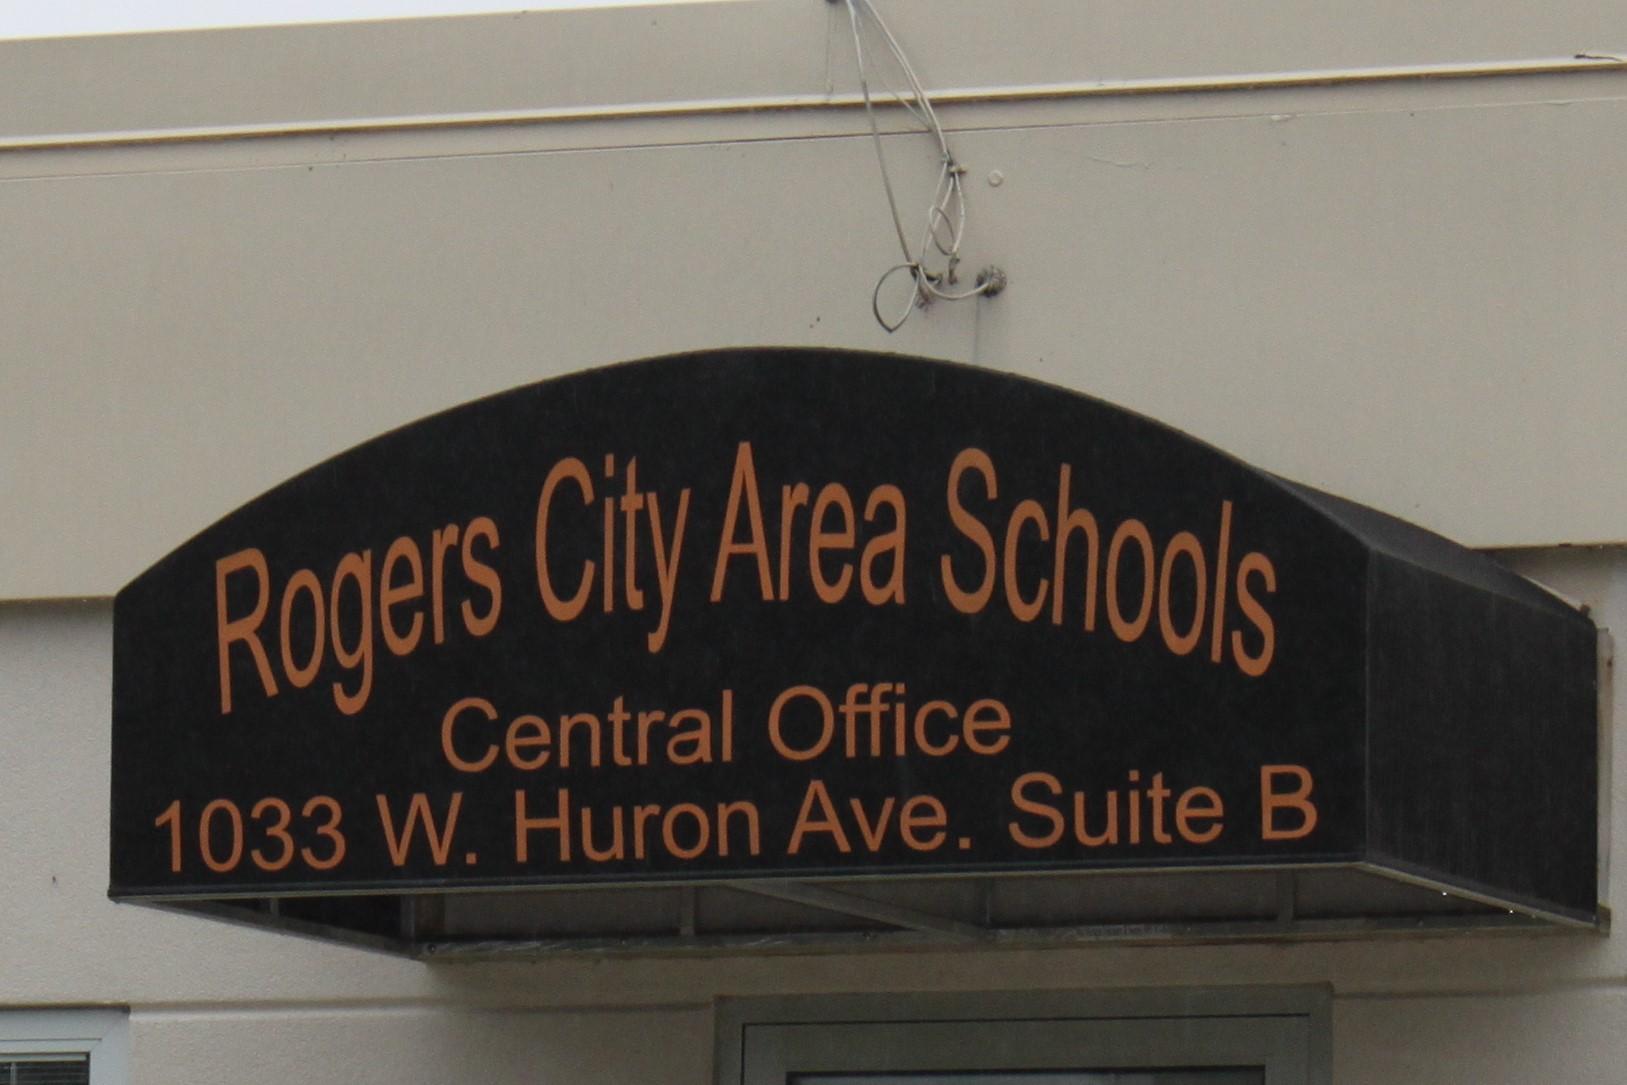 Rogers City Area Schools - 1033 West Huron AvenueRogers City, MI 49779(989) 734-9100